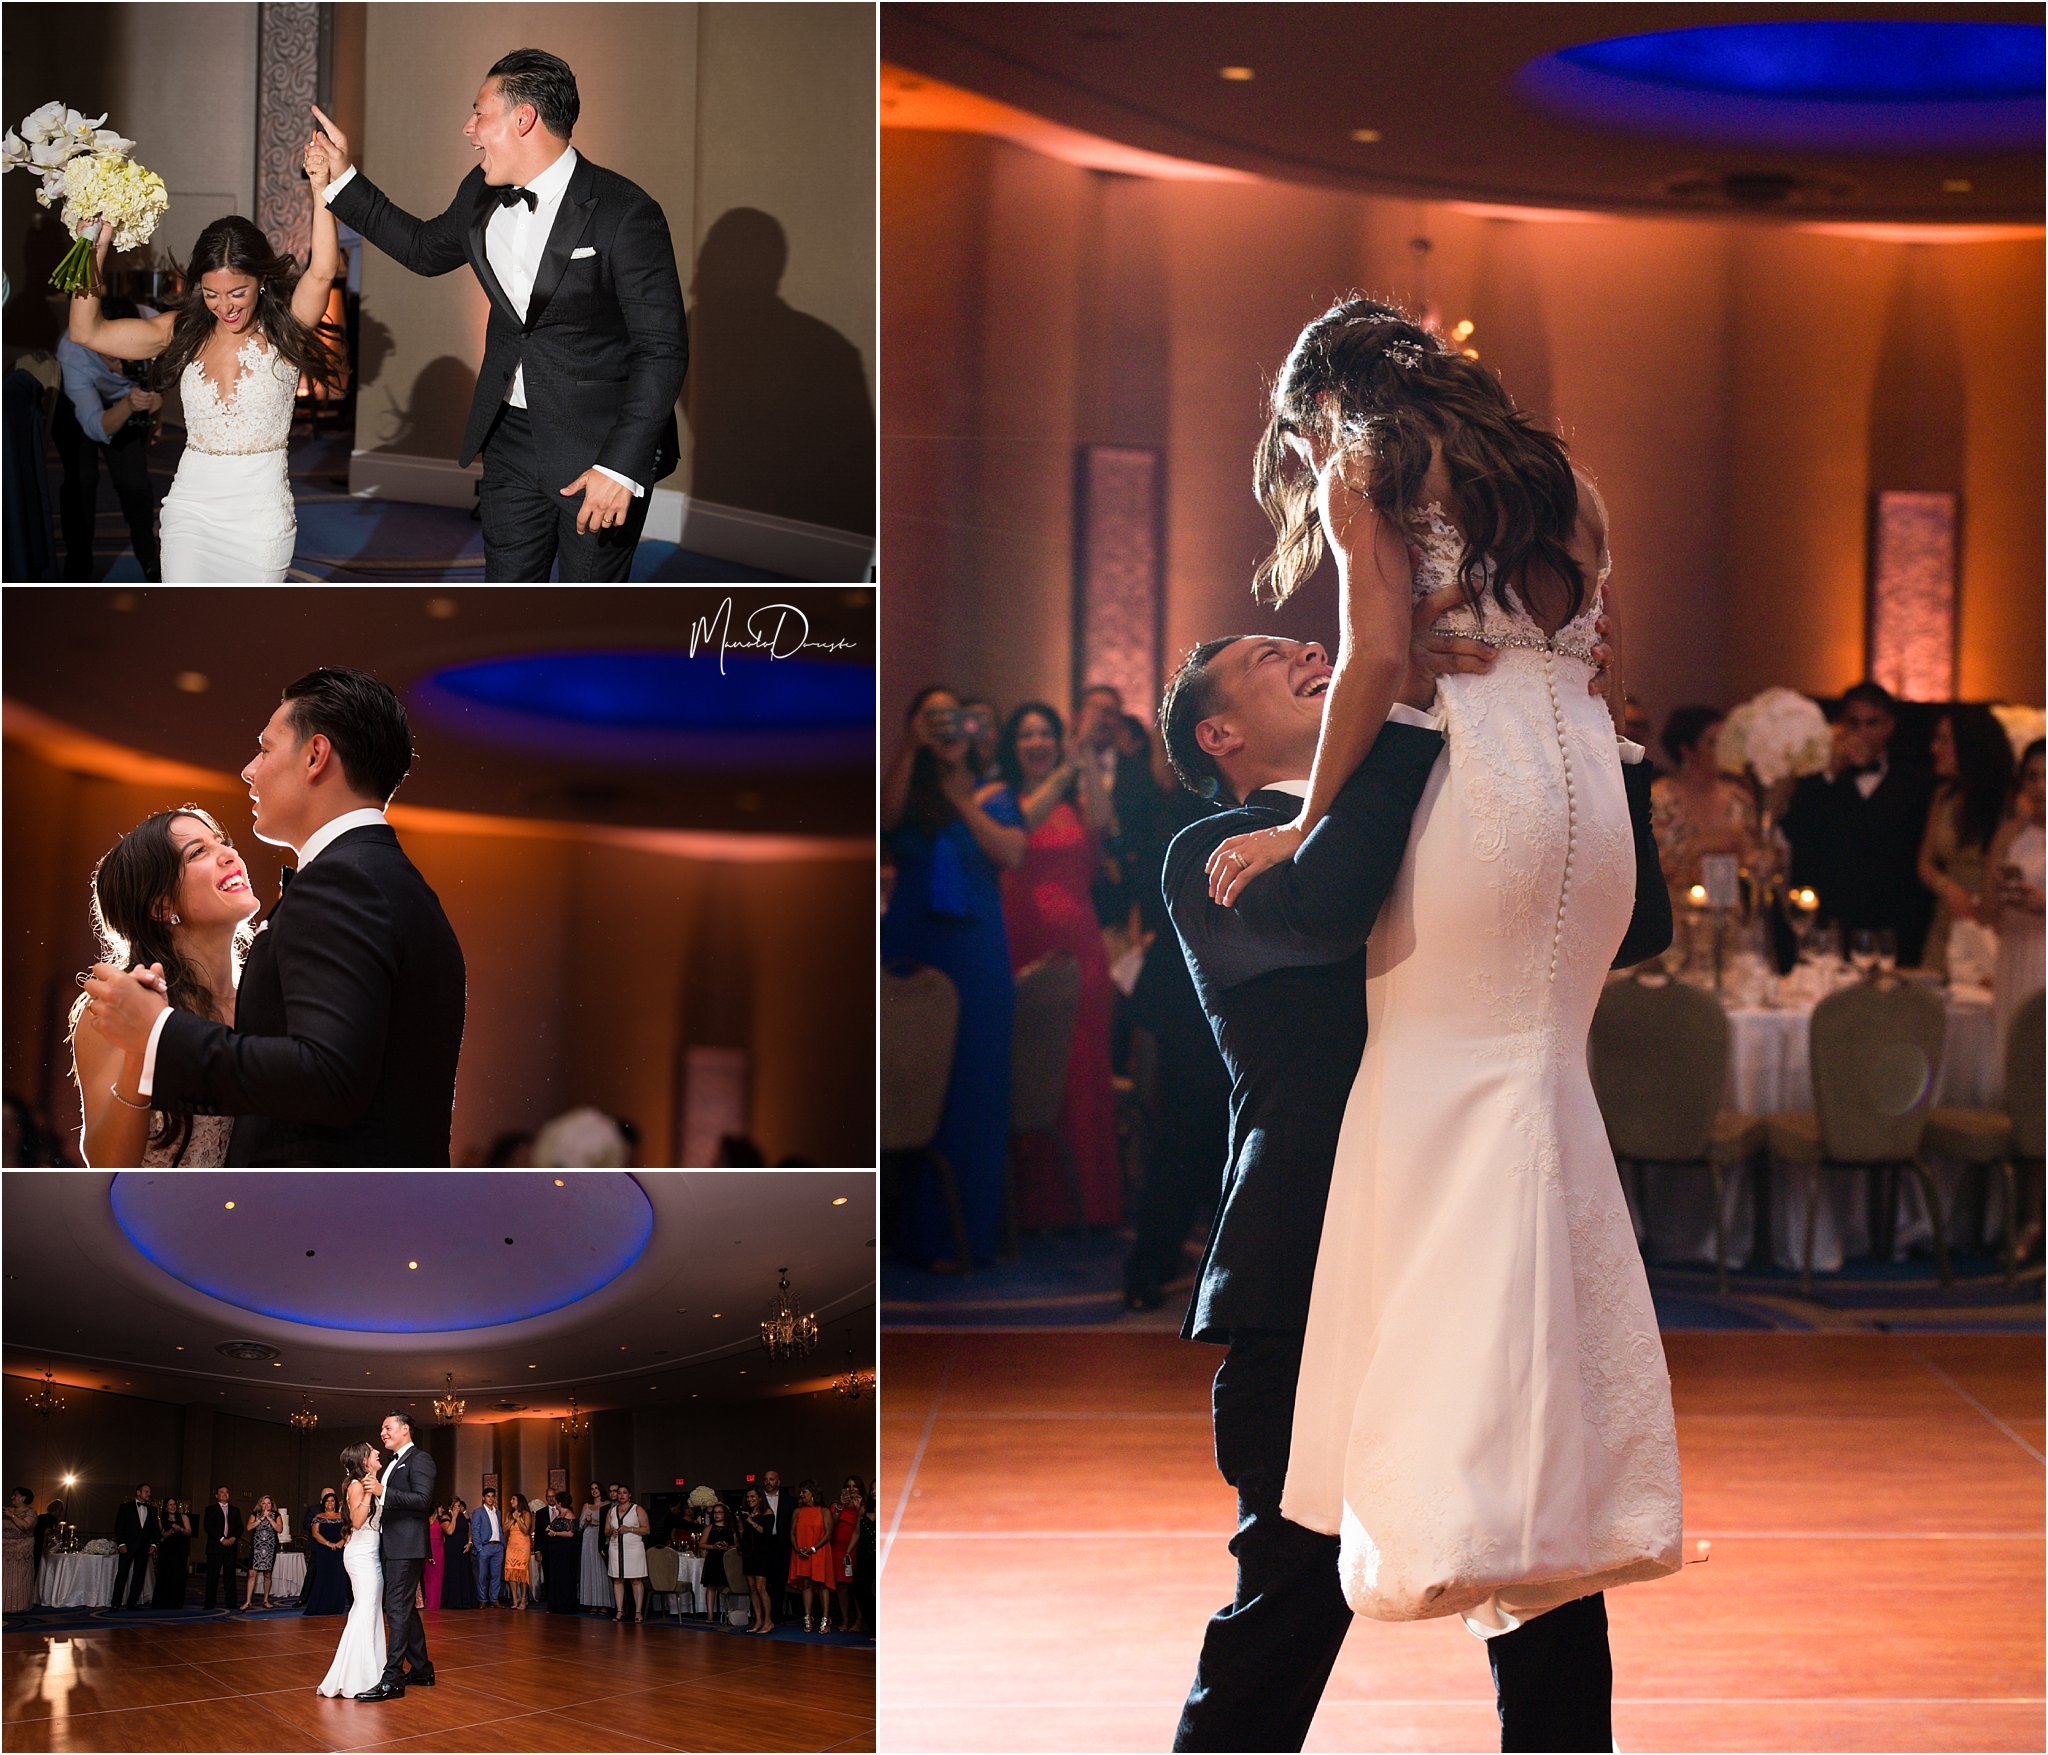 0331_ManoloDoreste_InFocusStudios_Wedding_Family_Photography_Miami_MiamiPhotographer.jpg